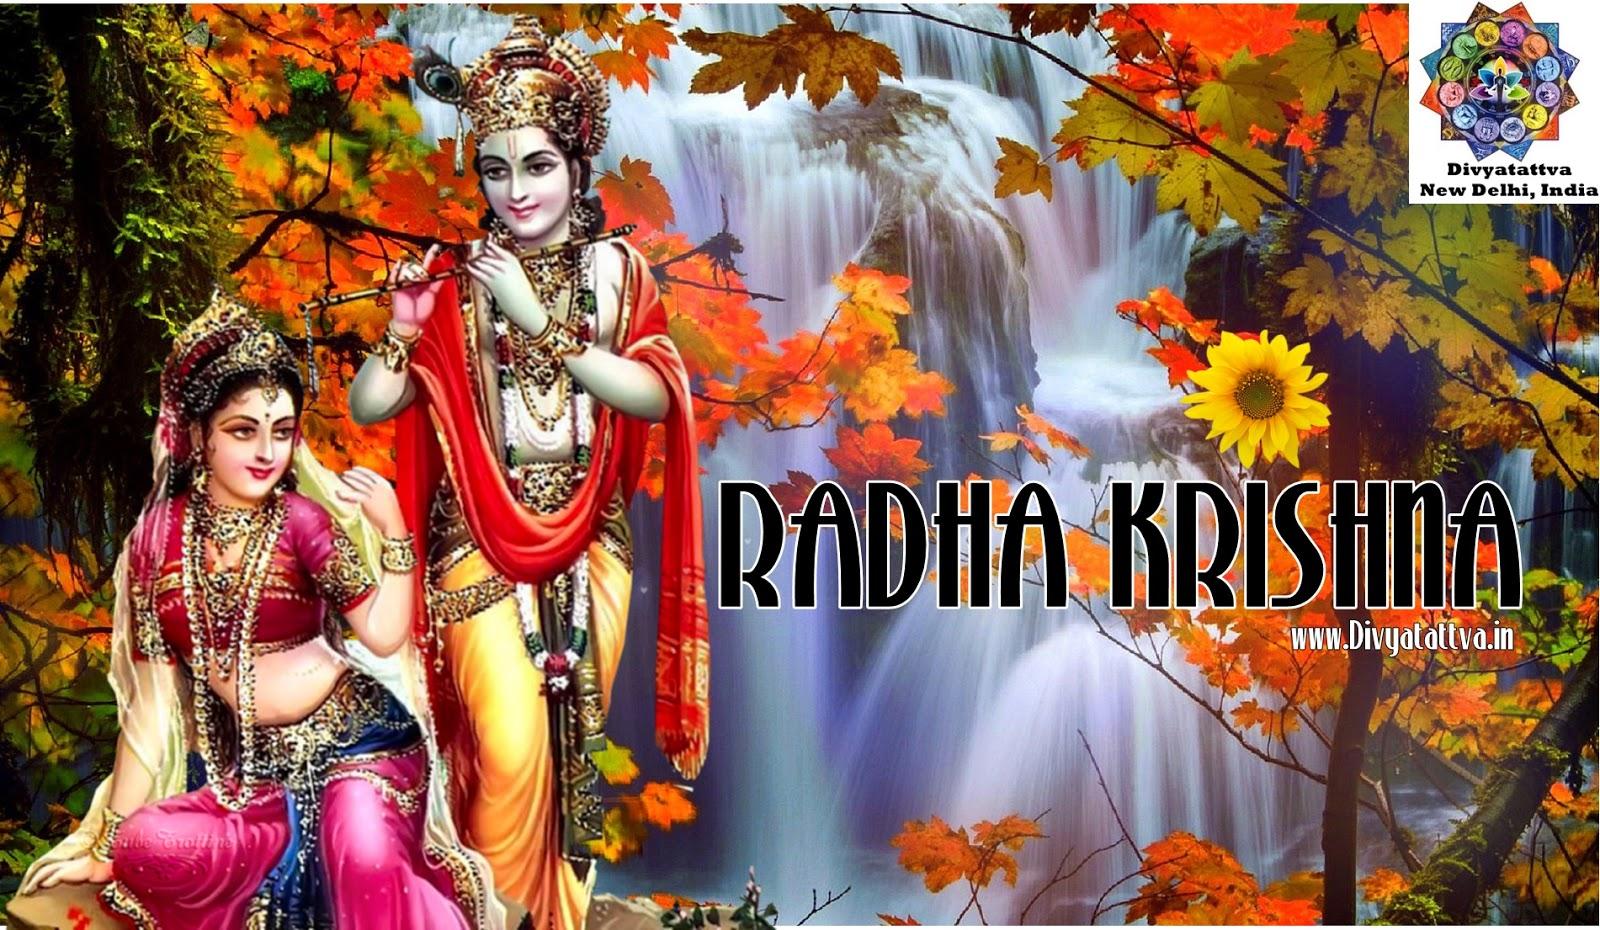 krishna radha hd wallpaper 4k hindu gods images photos backgrounds www.divyatattva.in